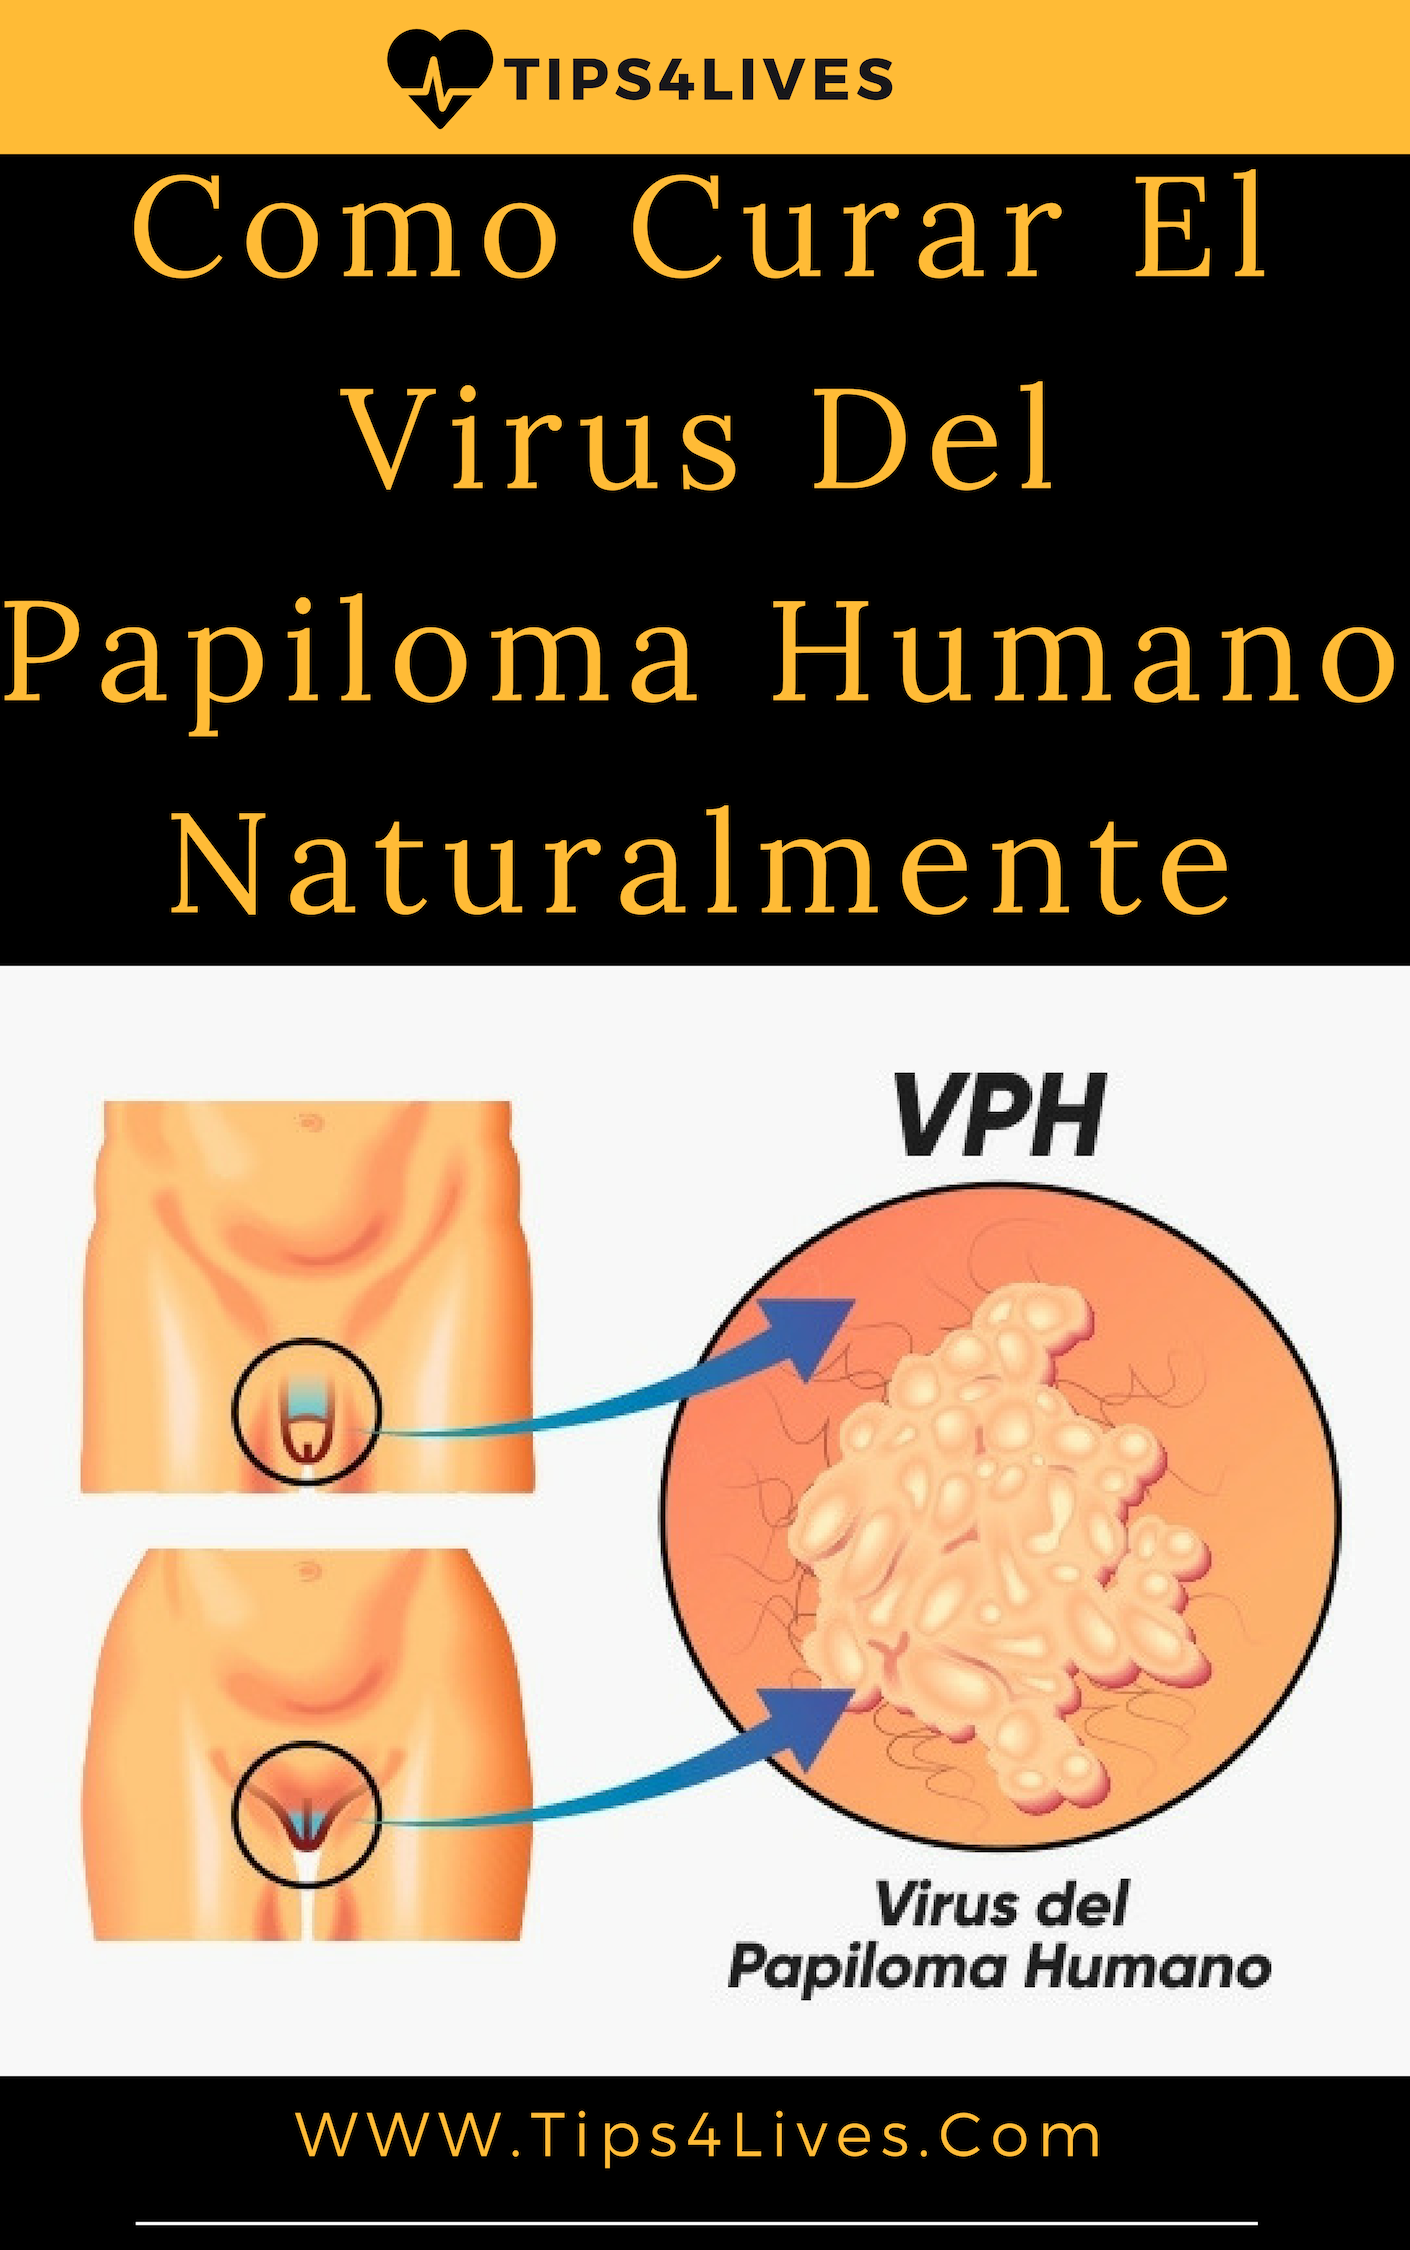 papilomavirus humano hpv genital foot verruca black